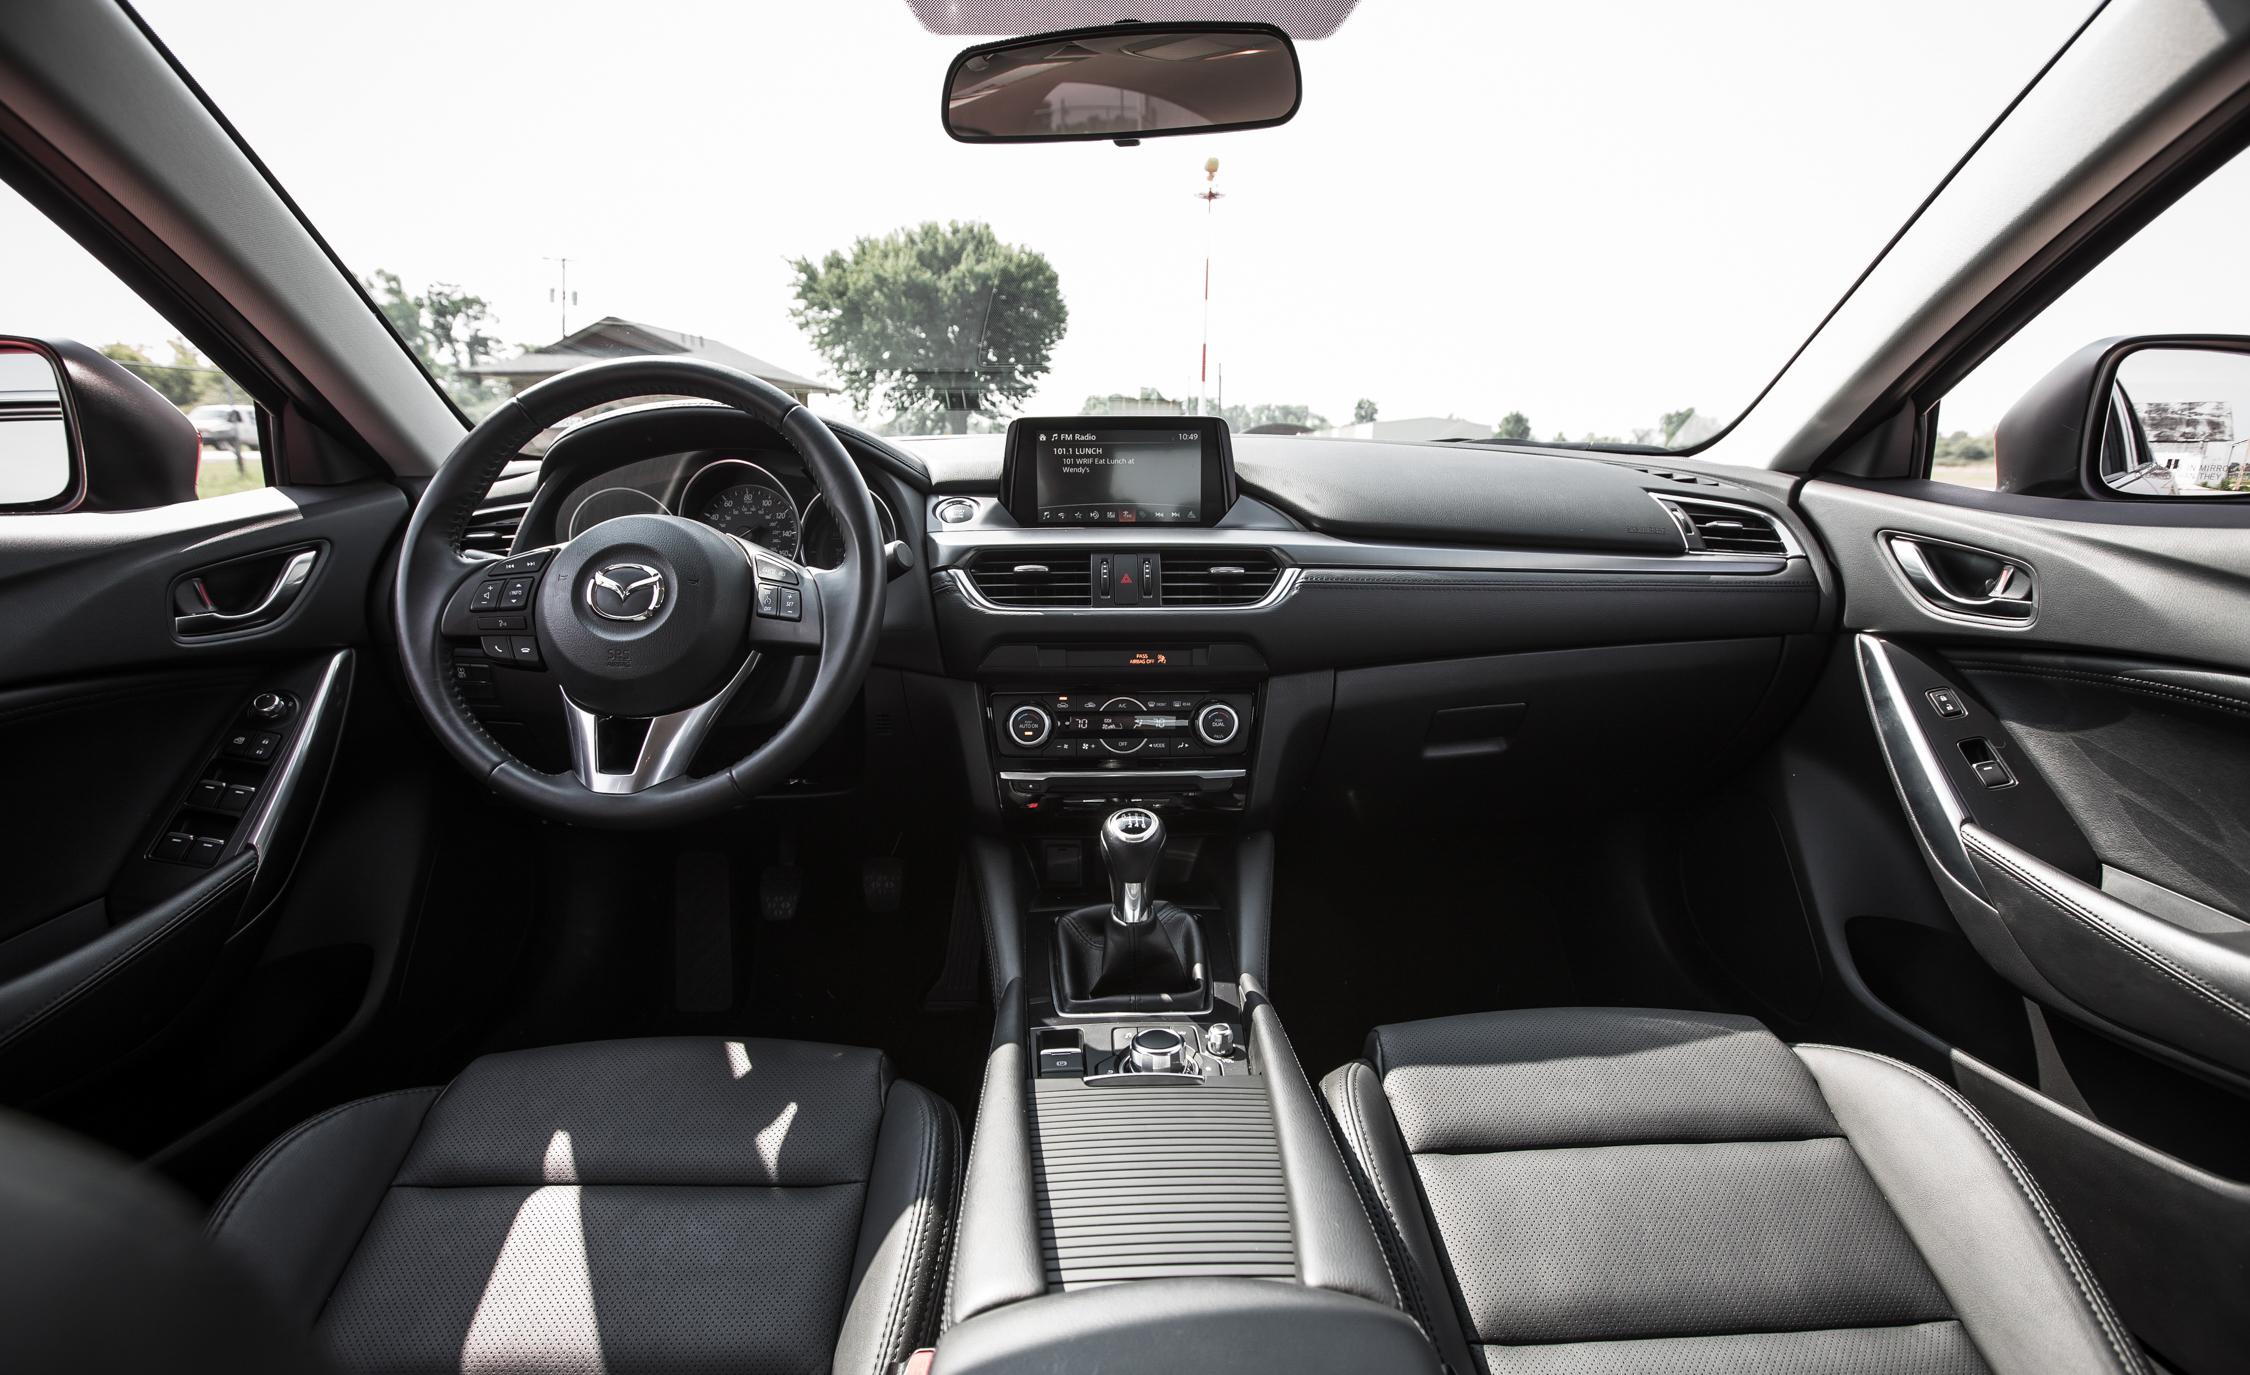 2016 Mazda 6 Touring Interior Dashboard